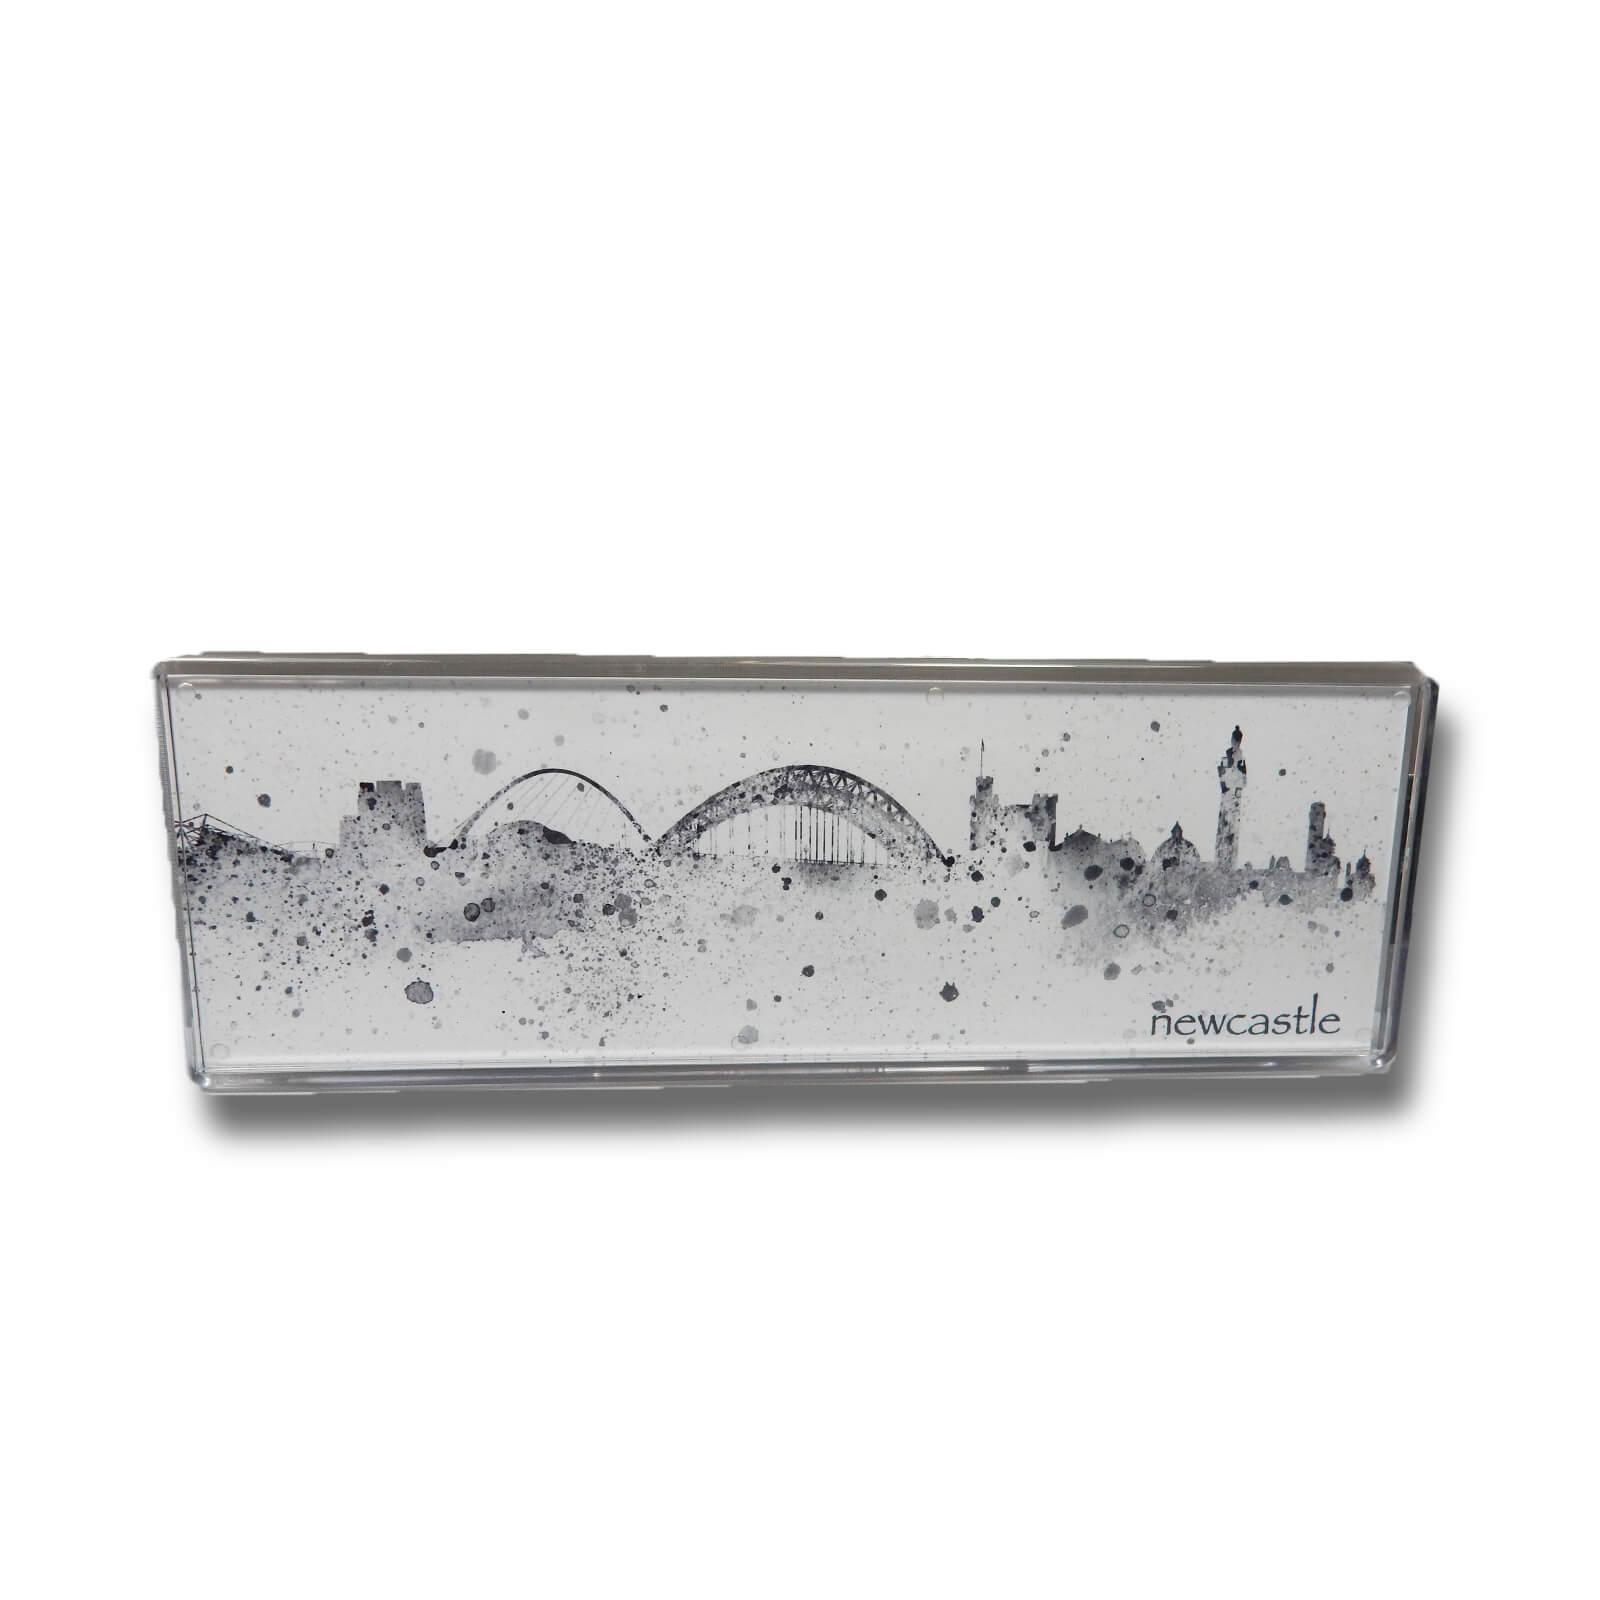 Newcastle Skyline Black & White Illustrated Panoramic Magnet